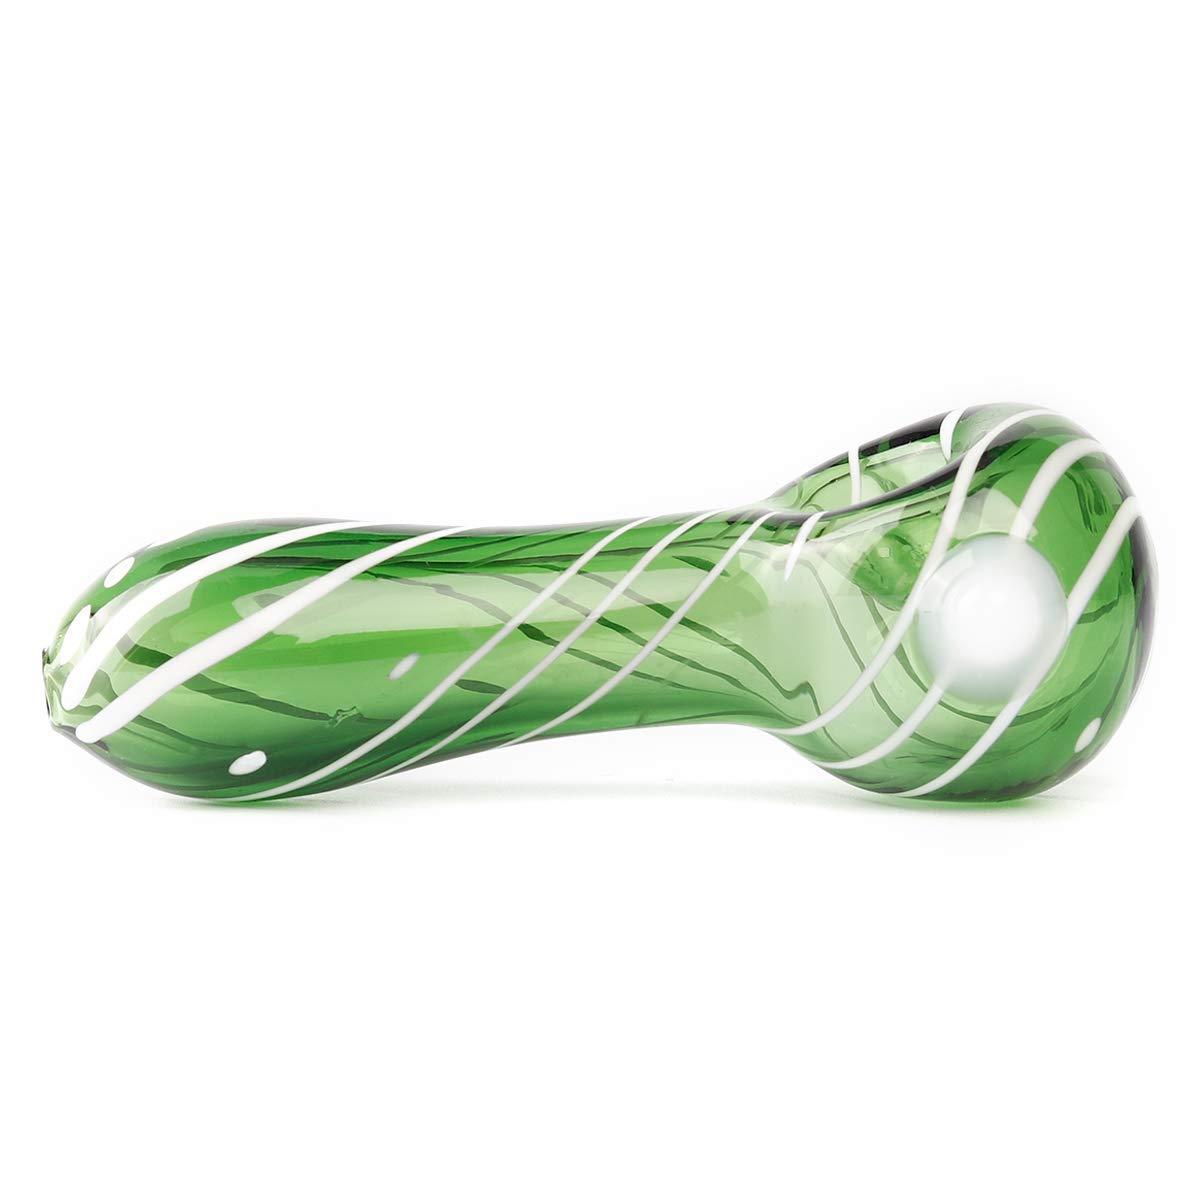 Borosilicate Glass Spoon Hand Pipe HaoCH Handmade Glass Tube Blue 4.4 Inch